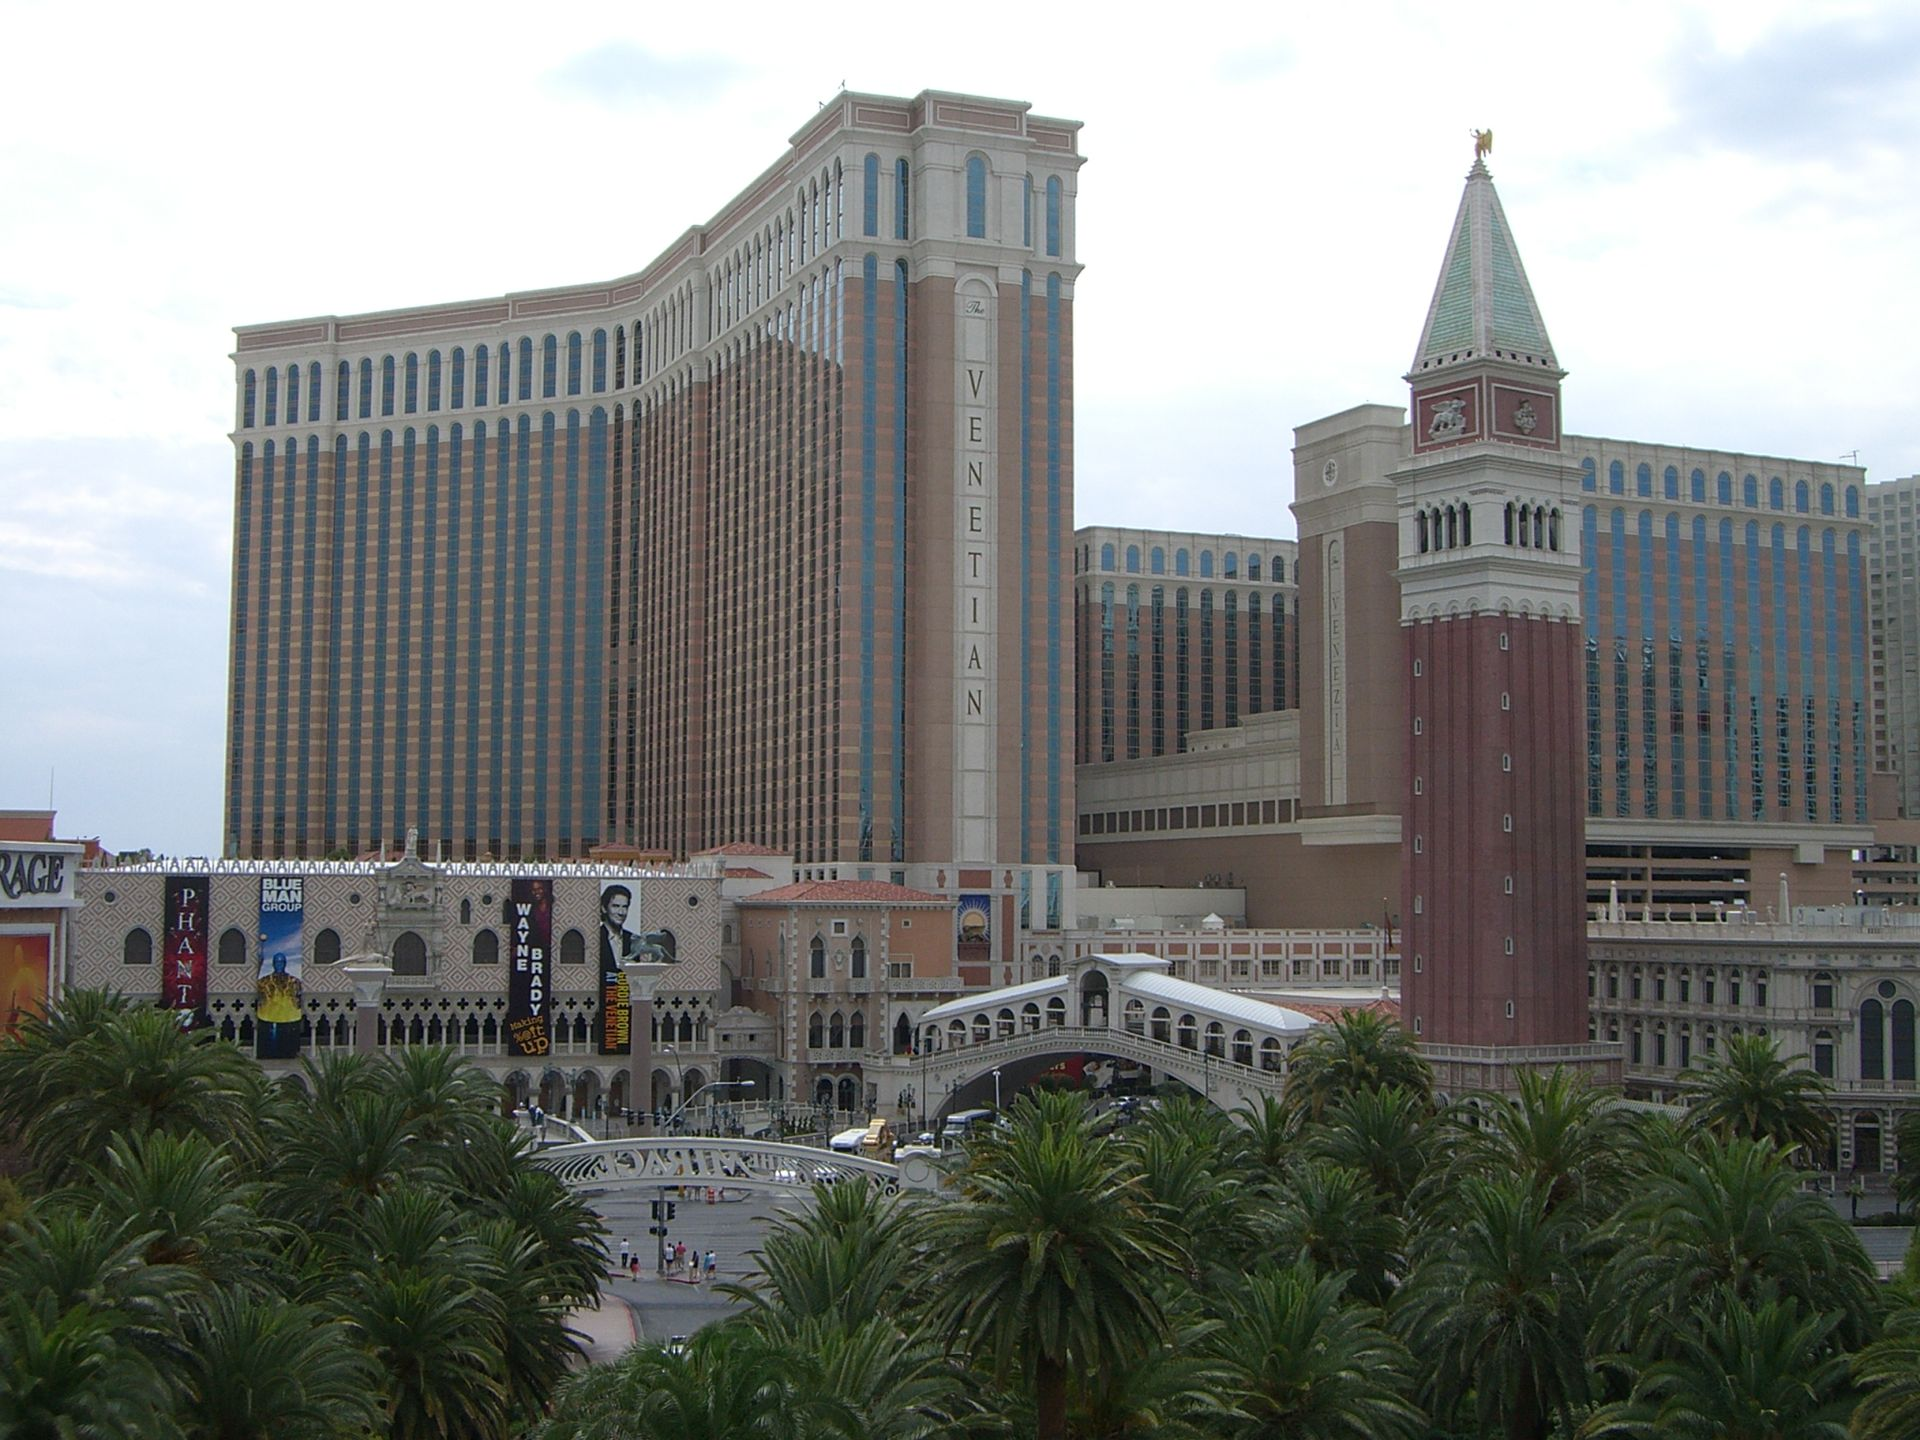 Sands Casino Las Vegas